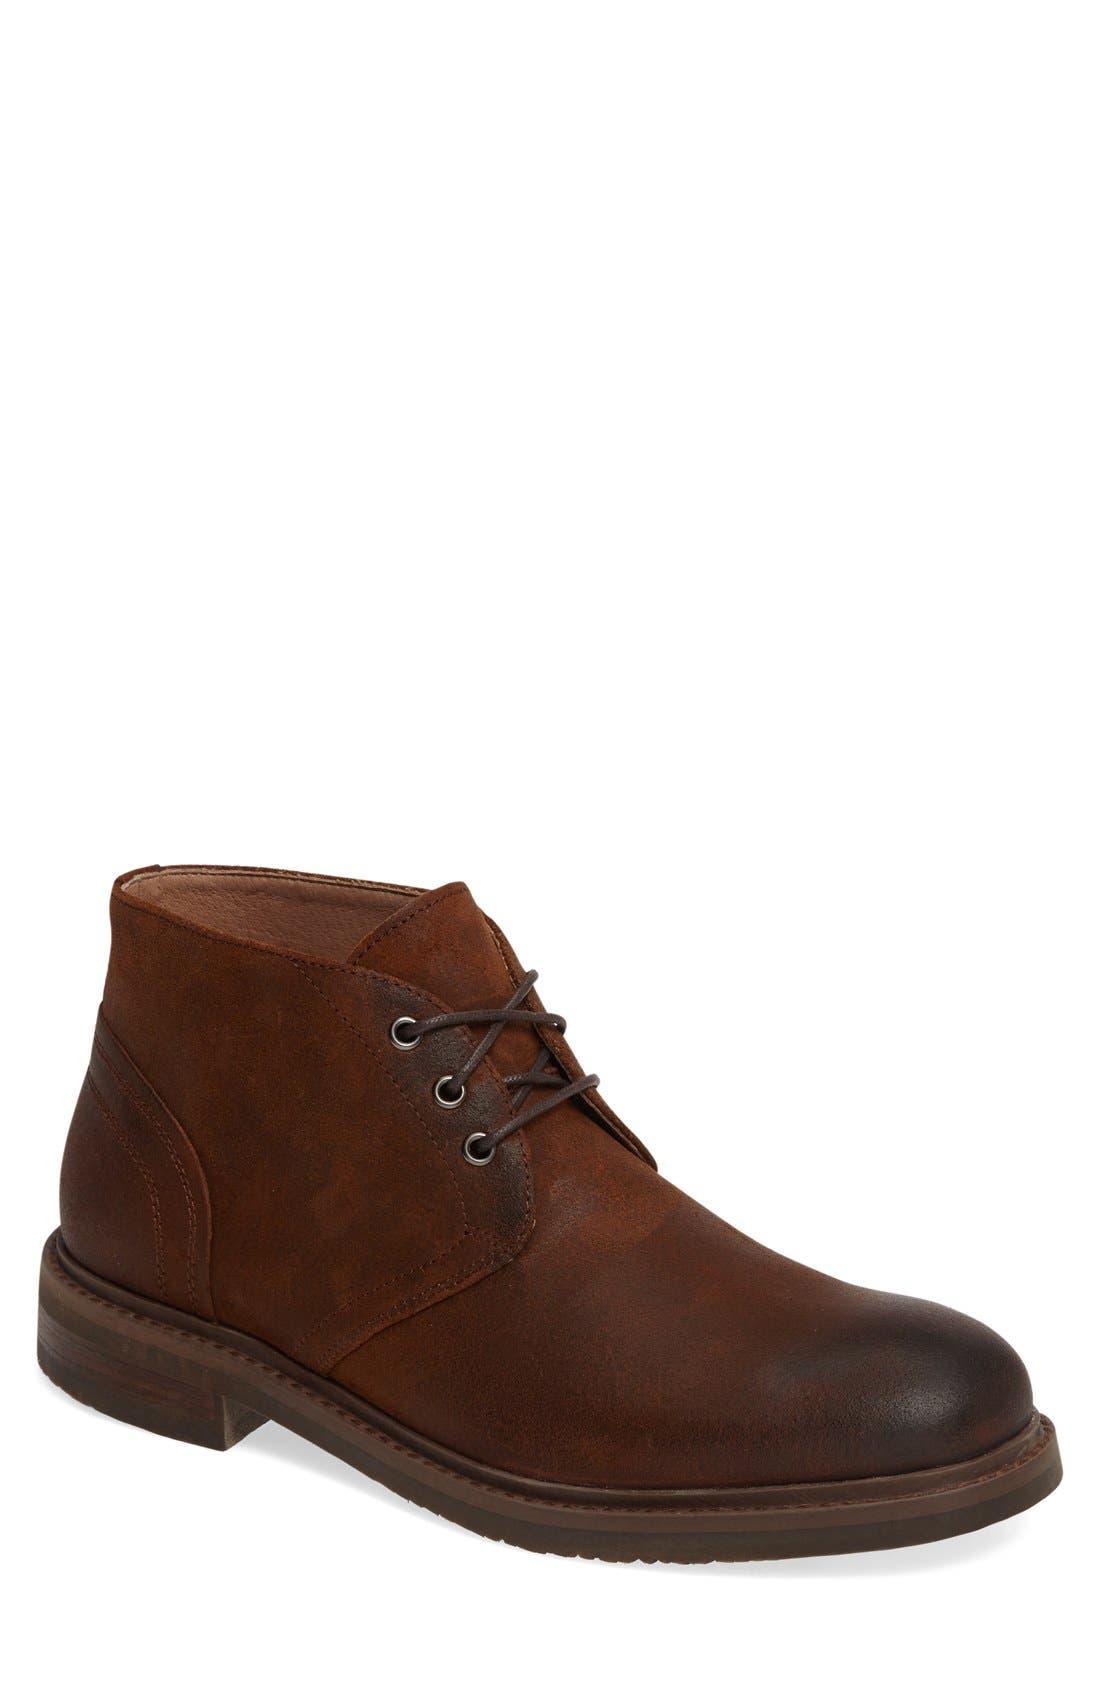 Alternate Image 1 Selected - 1901 'Calgary' Chukka Boot (Men)